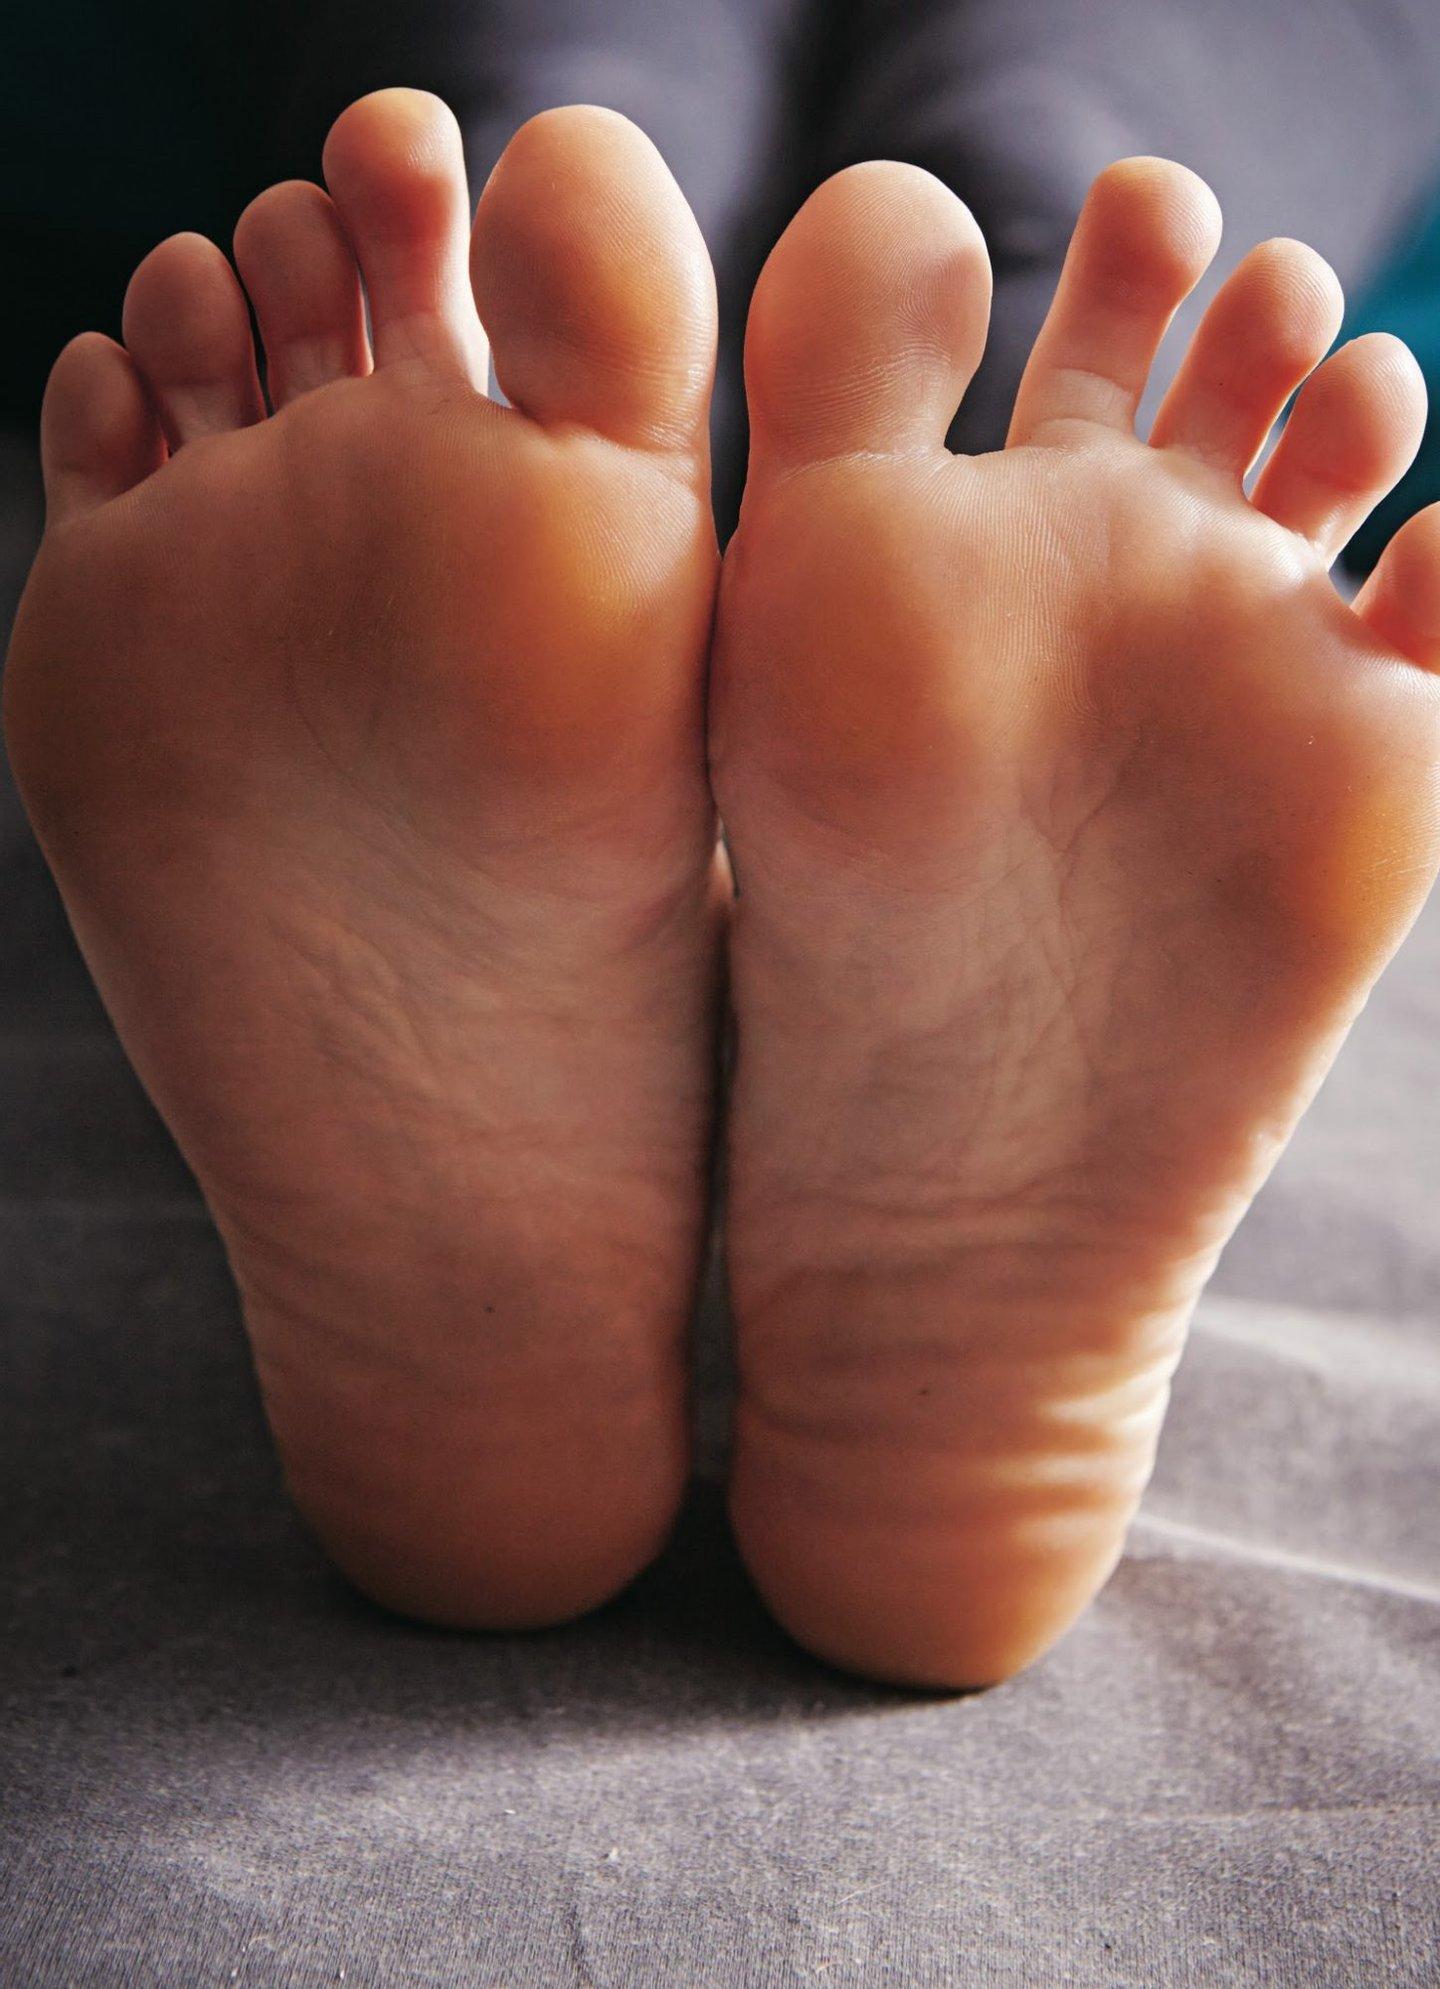 01_140523_LIPPMAN_New_Health_Rules_yoga_342_conver